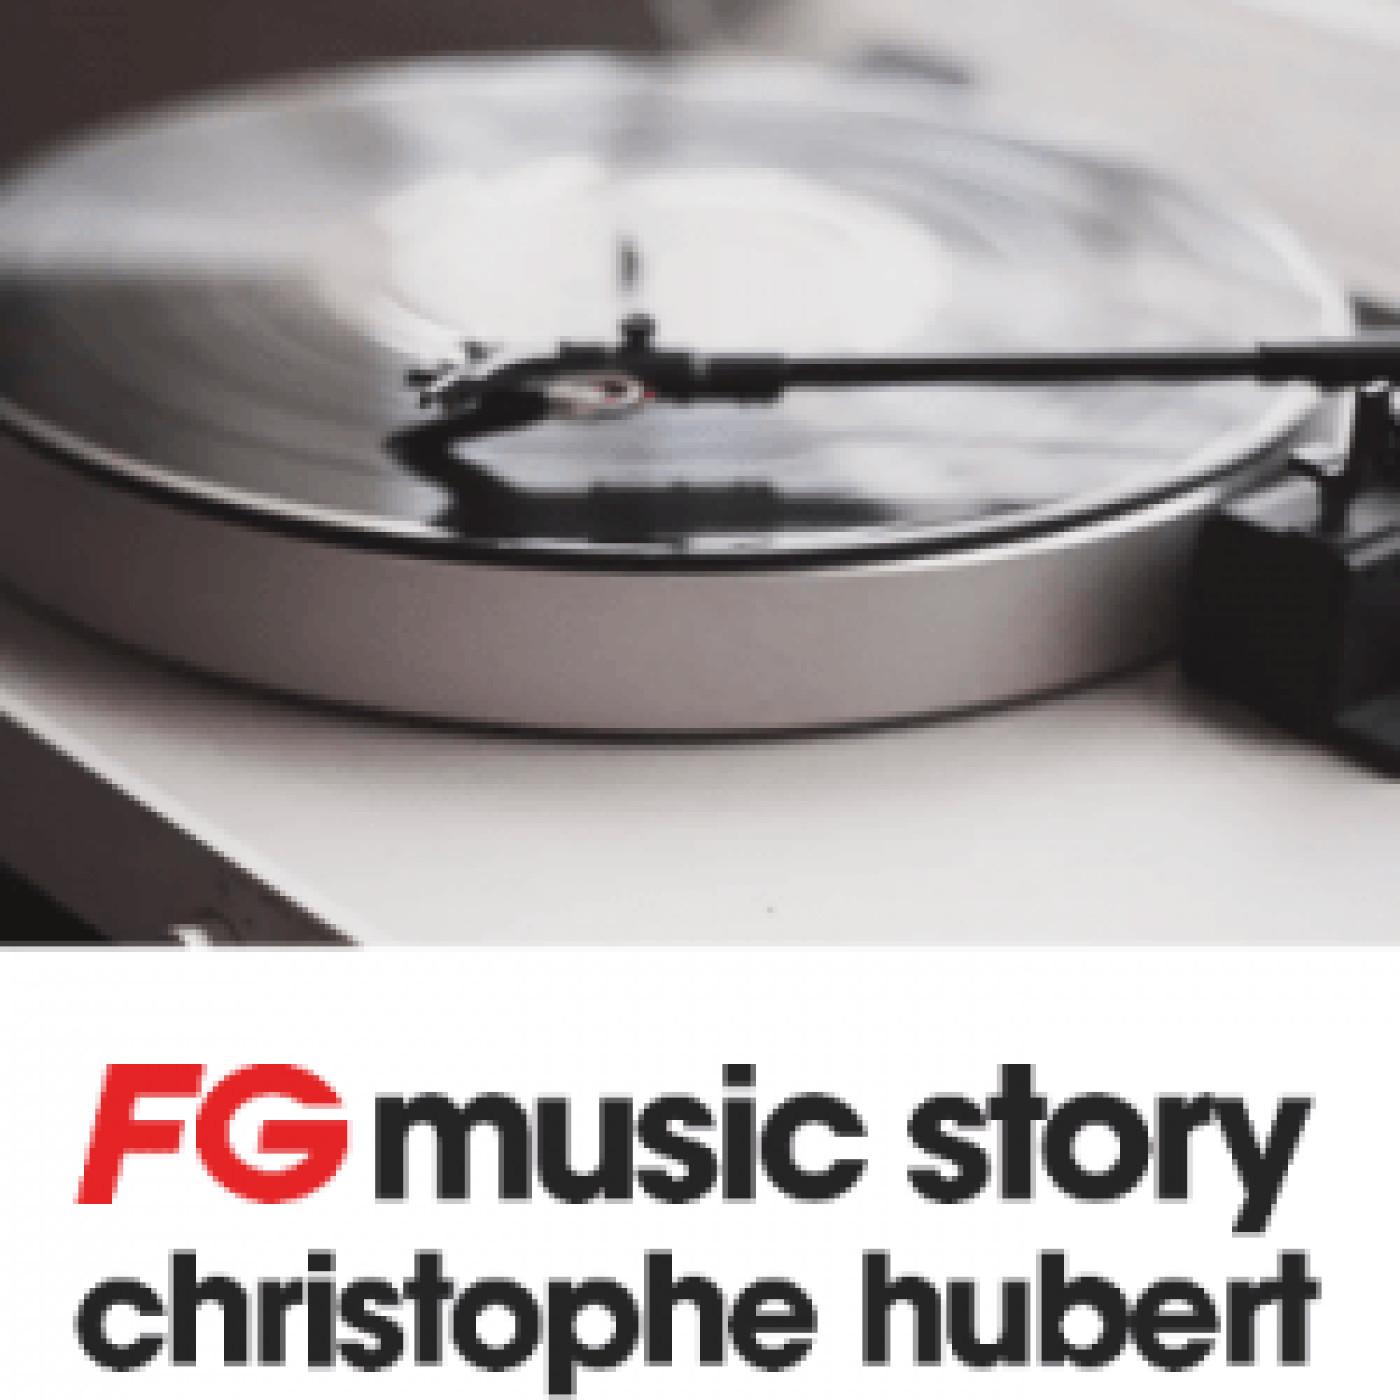 FG MUSIC STORY : CHICO ROSE